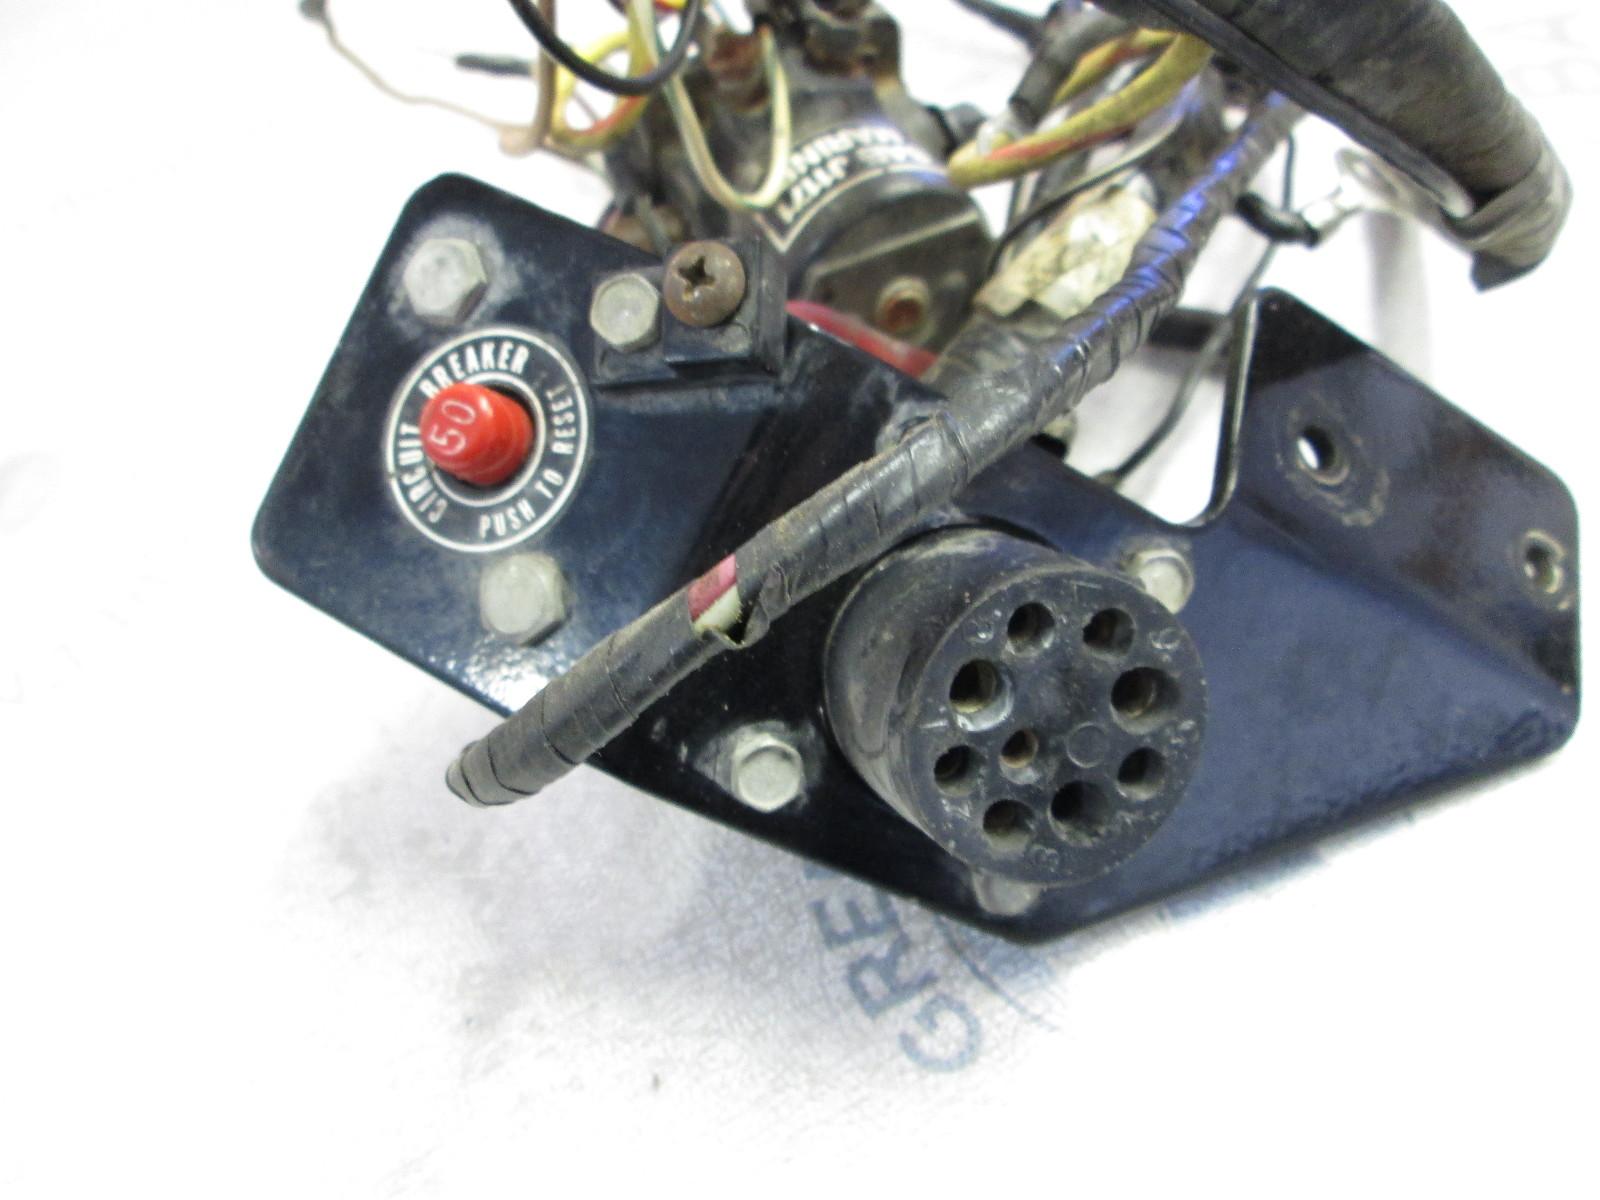 84-98269A9 98269 Engine Wire Harness Mercruiser 3.7 224 ...